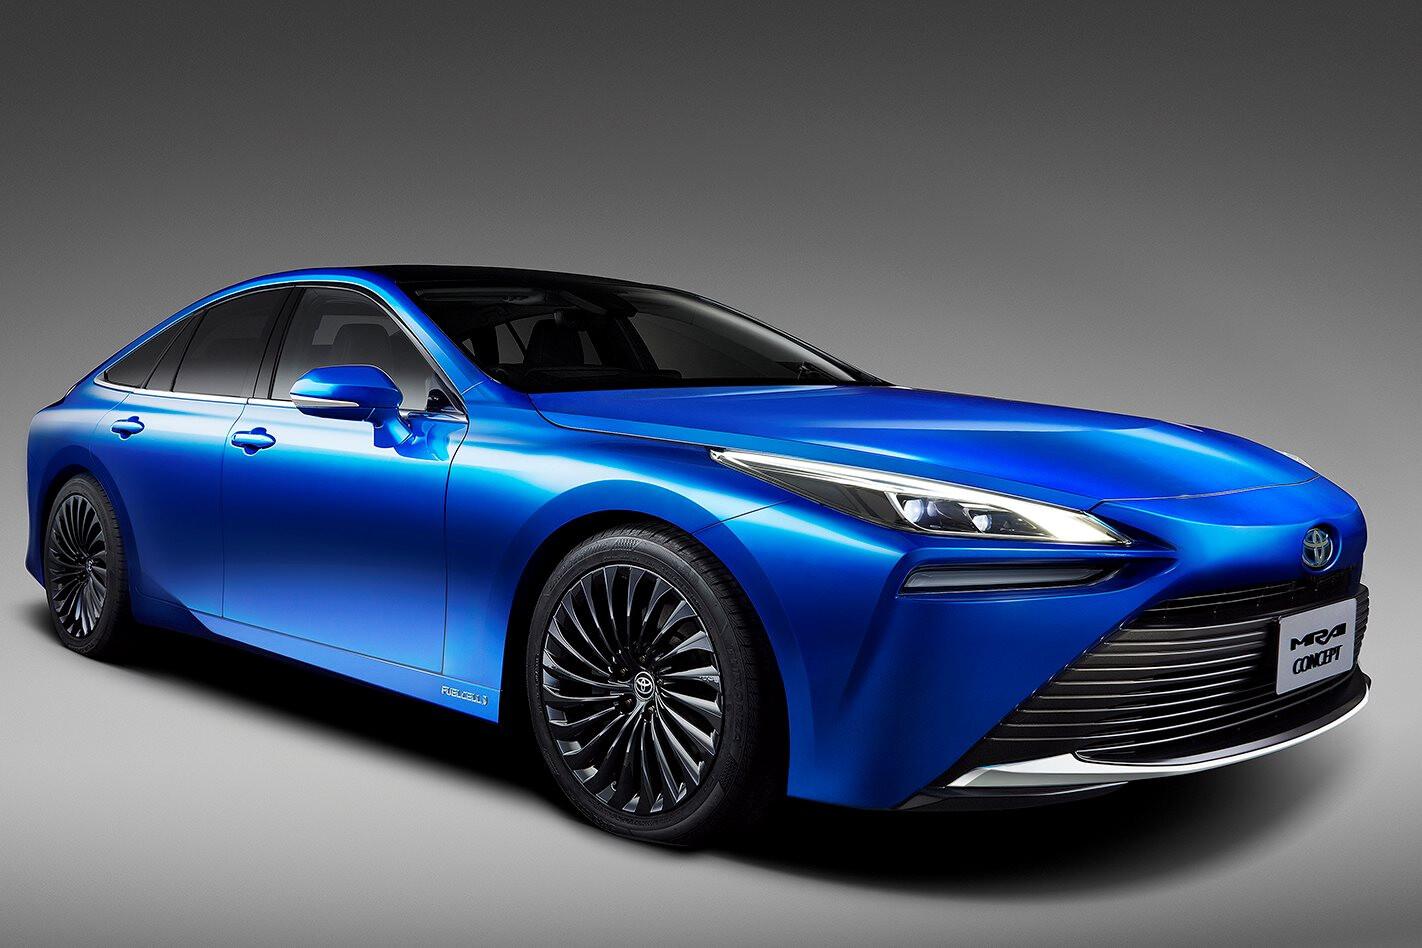 2020 Toyota Mirai Frontsidestatic Jpg